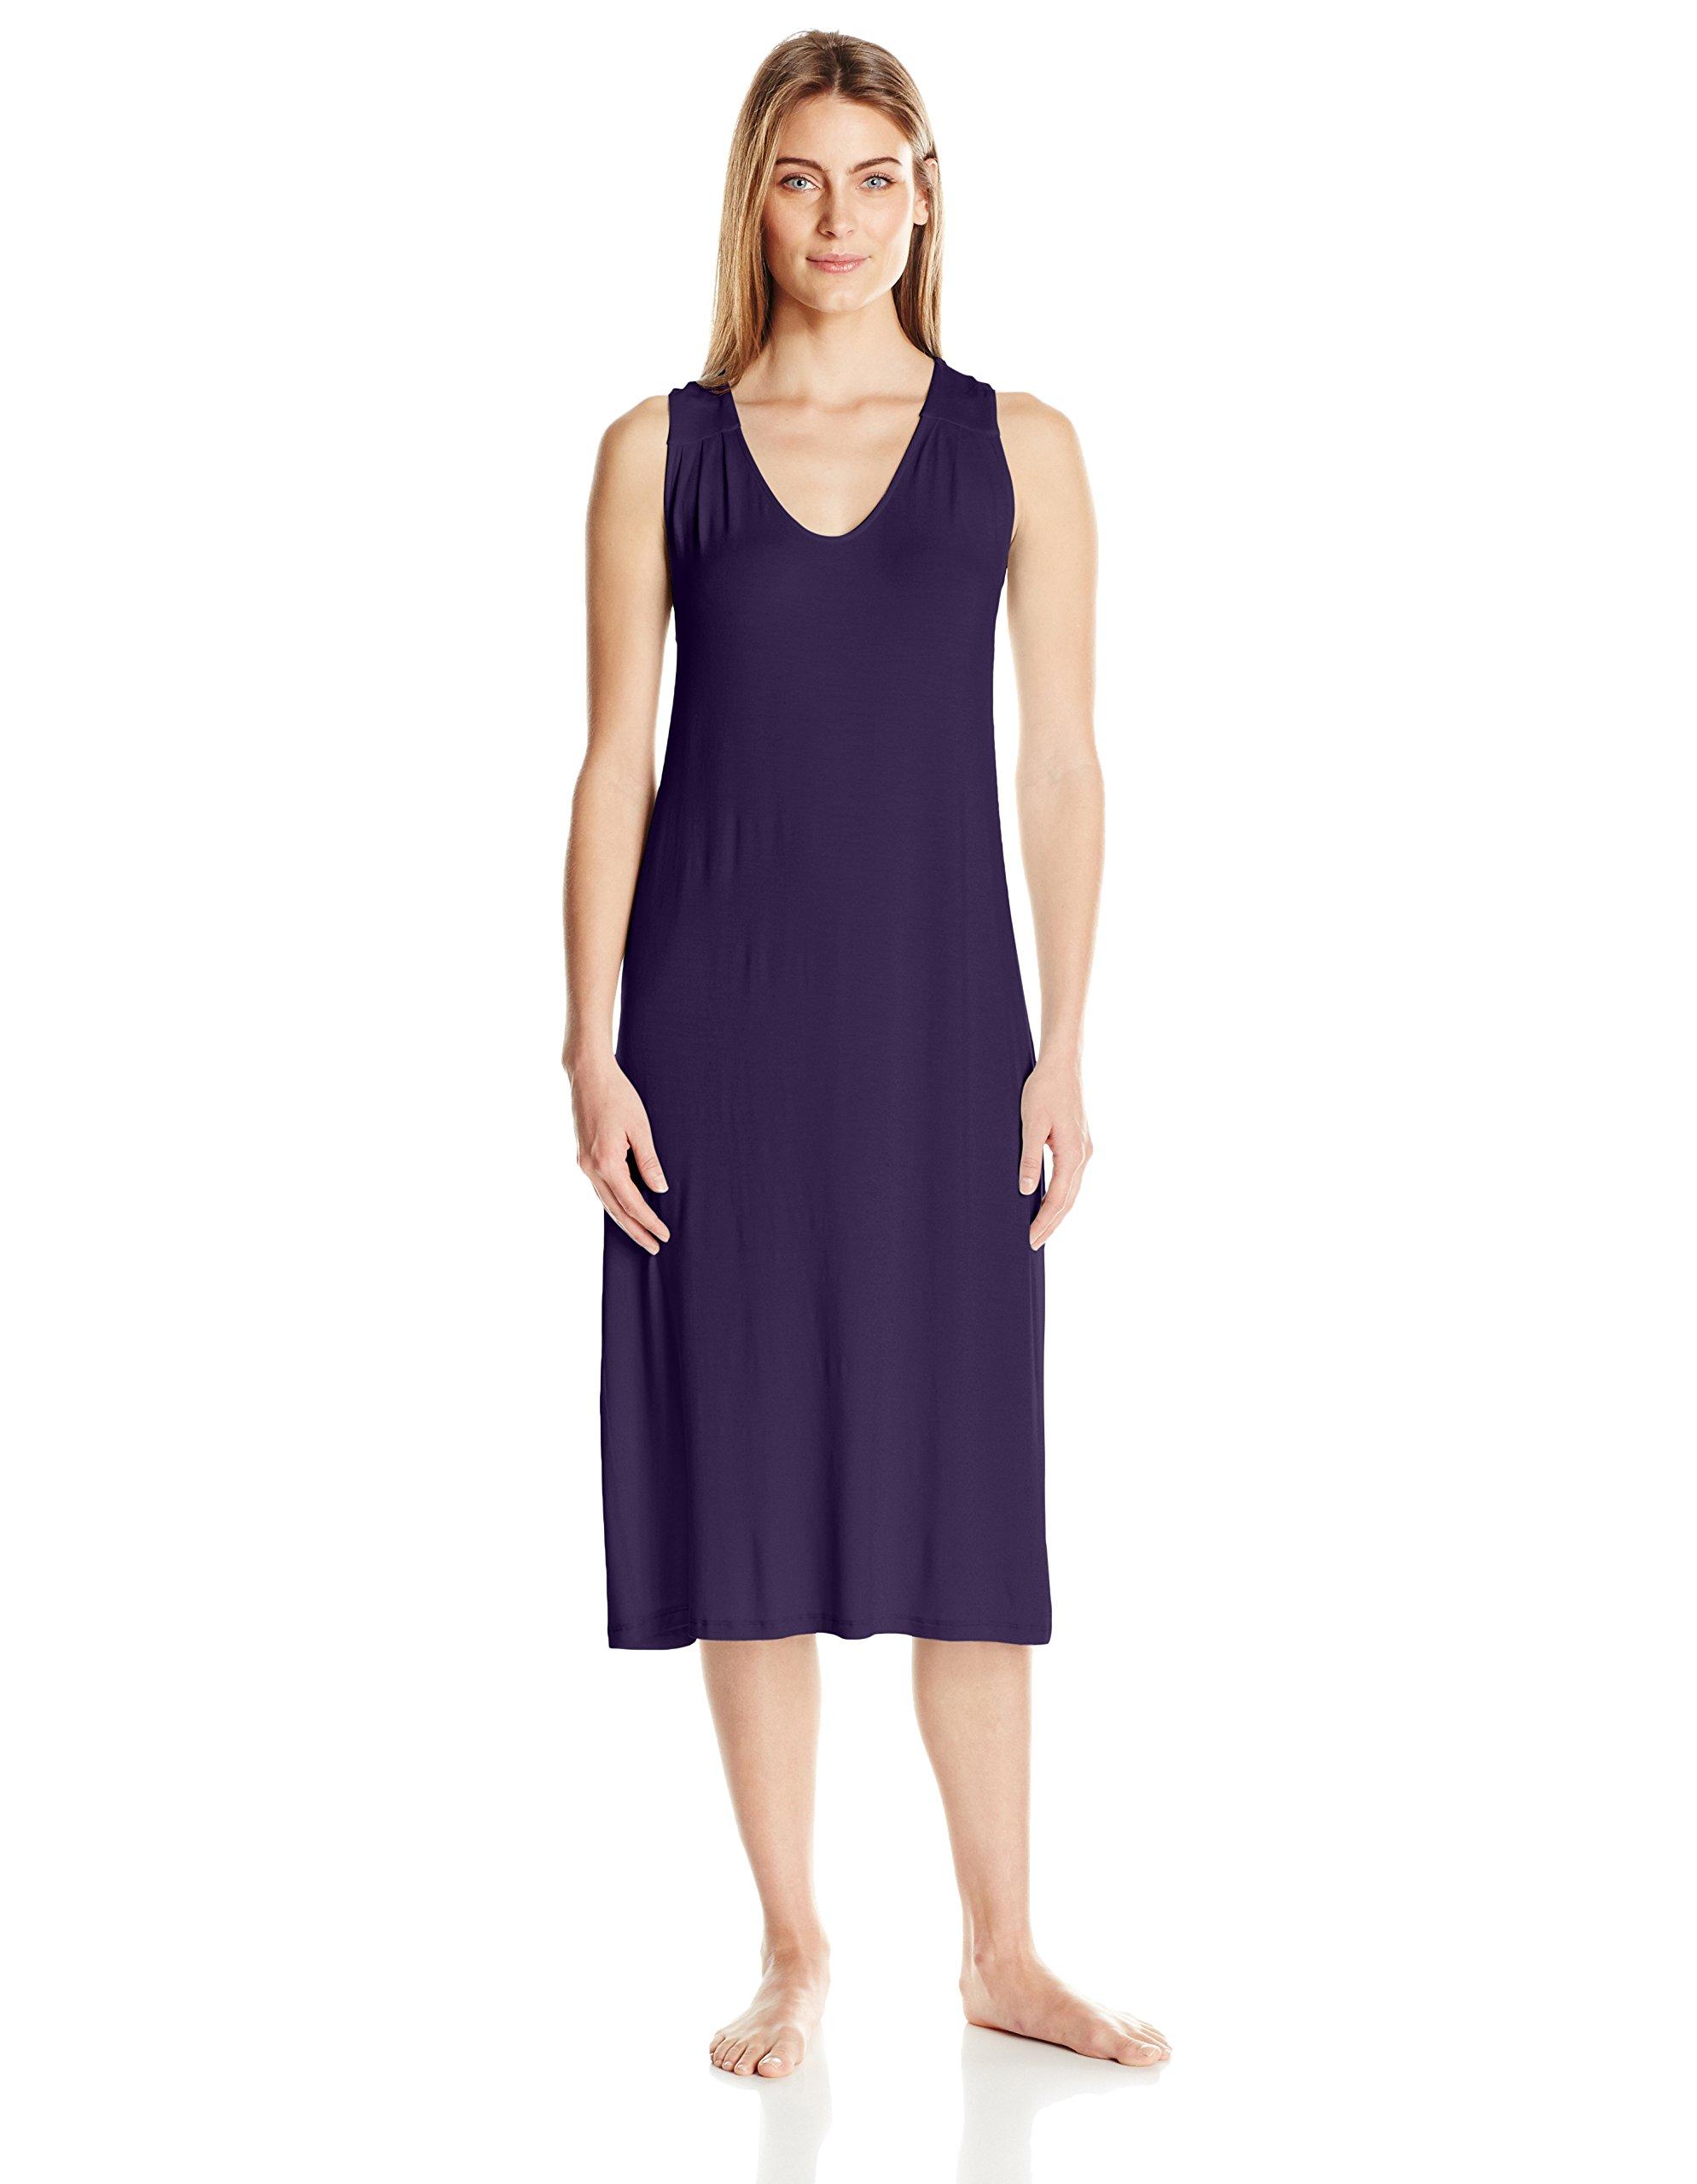 Arabella Women's Racerback Nightgown, Raisin, Medium Petite